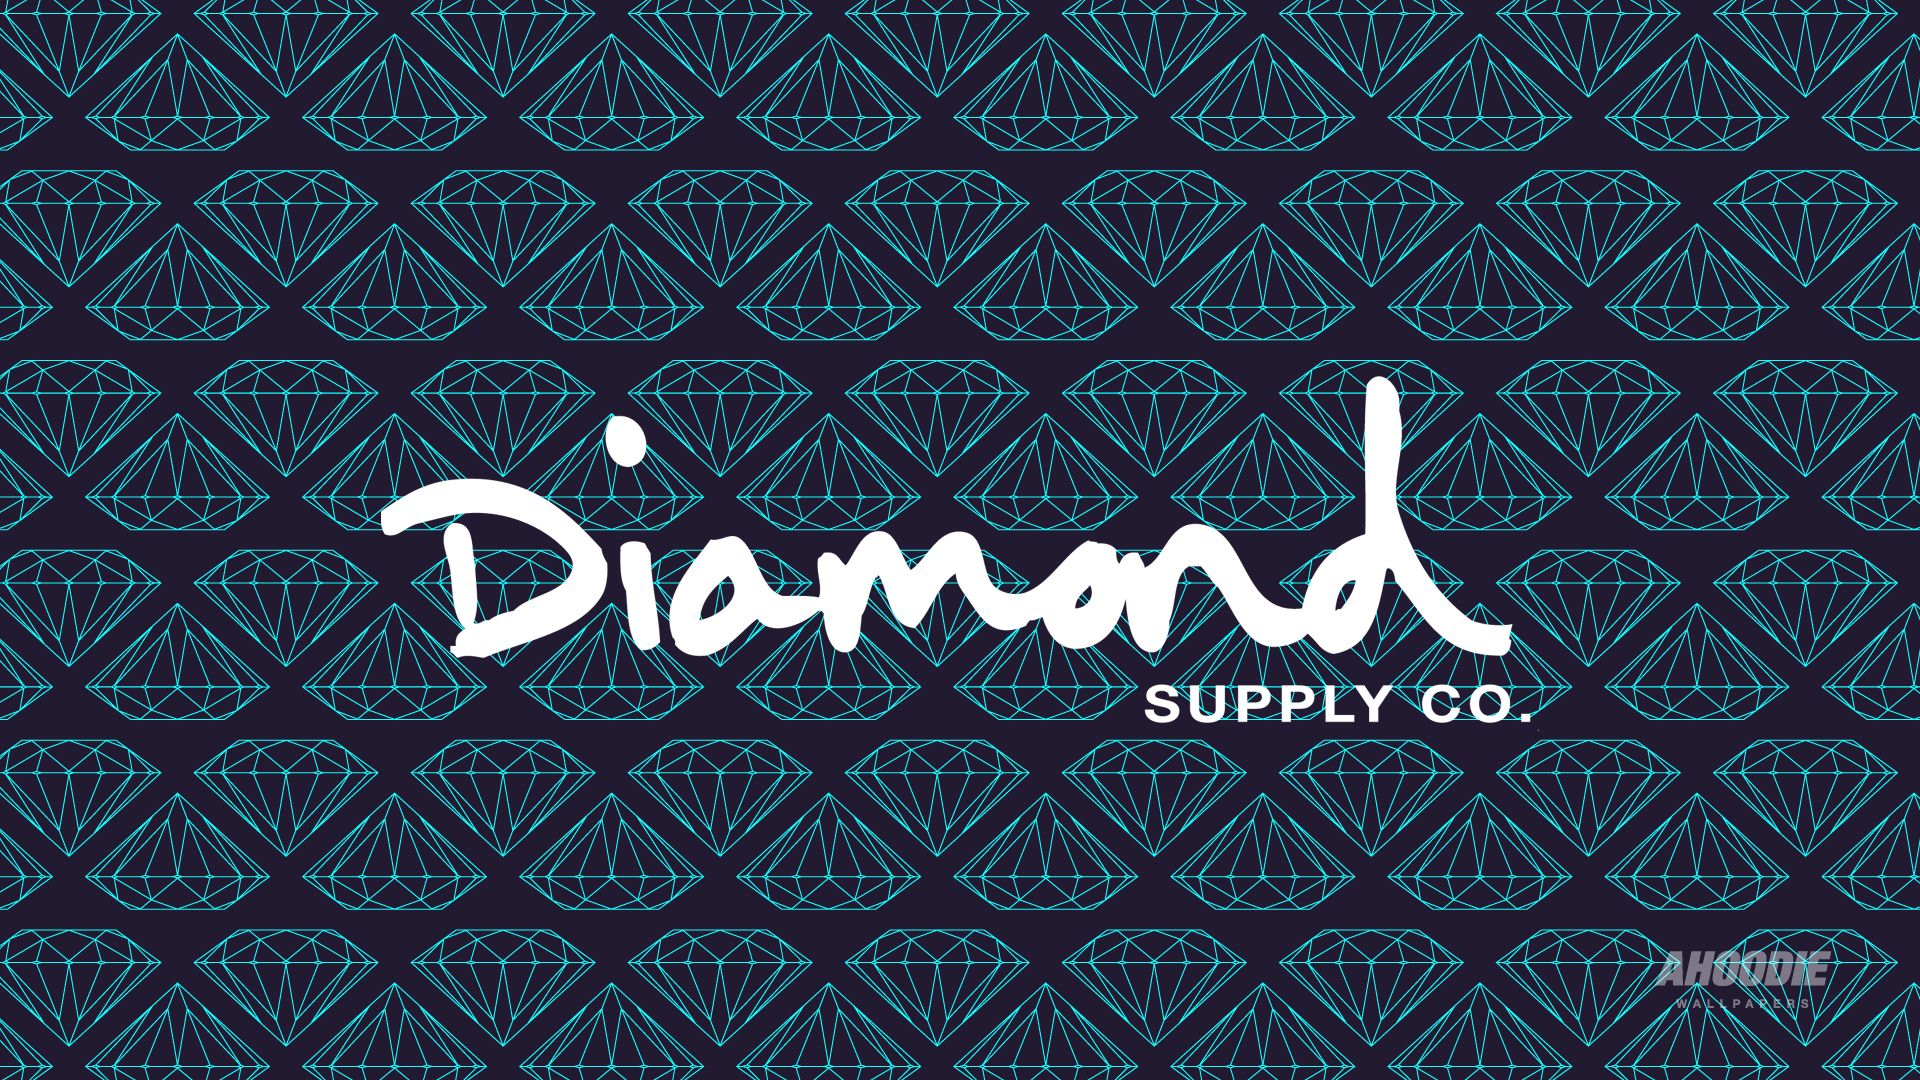 Diamond supply co mhmm pinterest diamond supply co voltagebd Choice Image